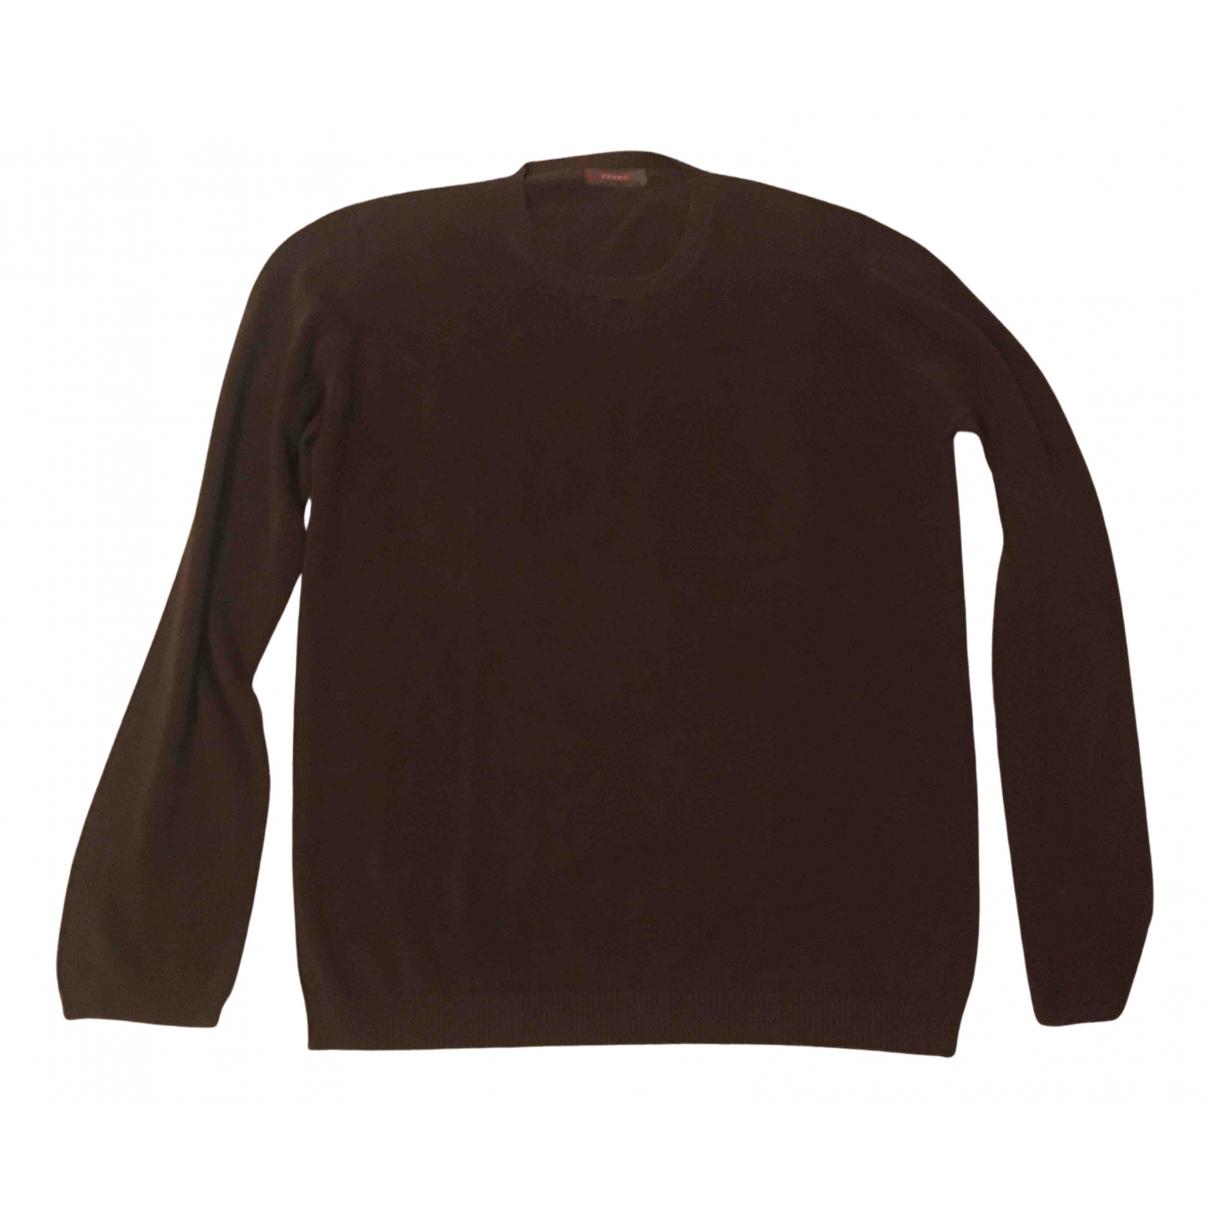 Prada N Brown Cotton Knitwear & Sweatshirts for Men 54 IT